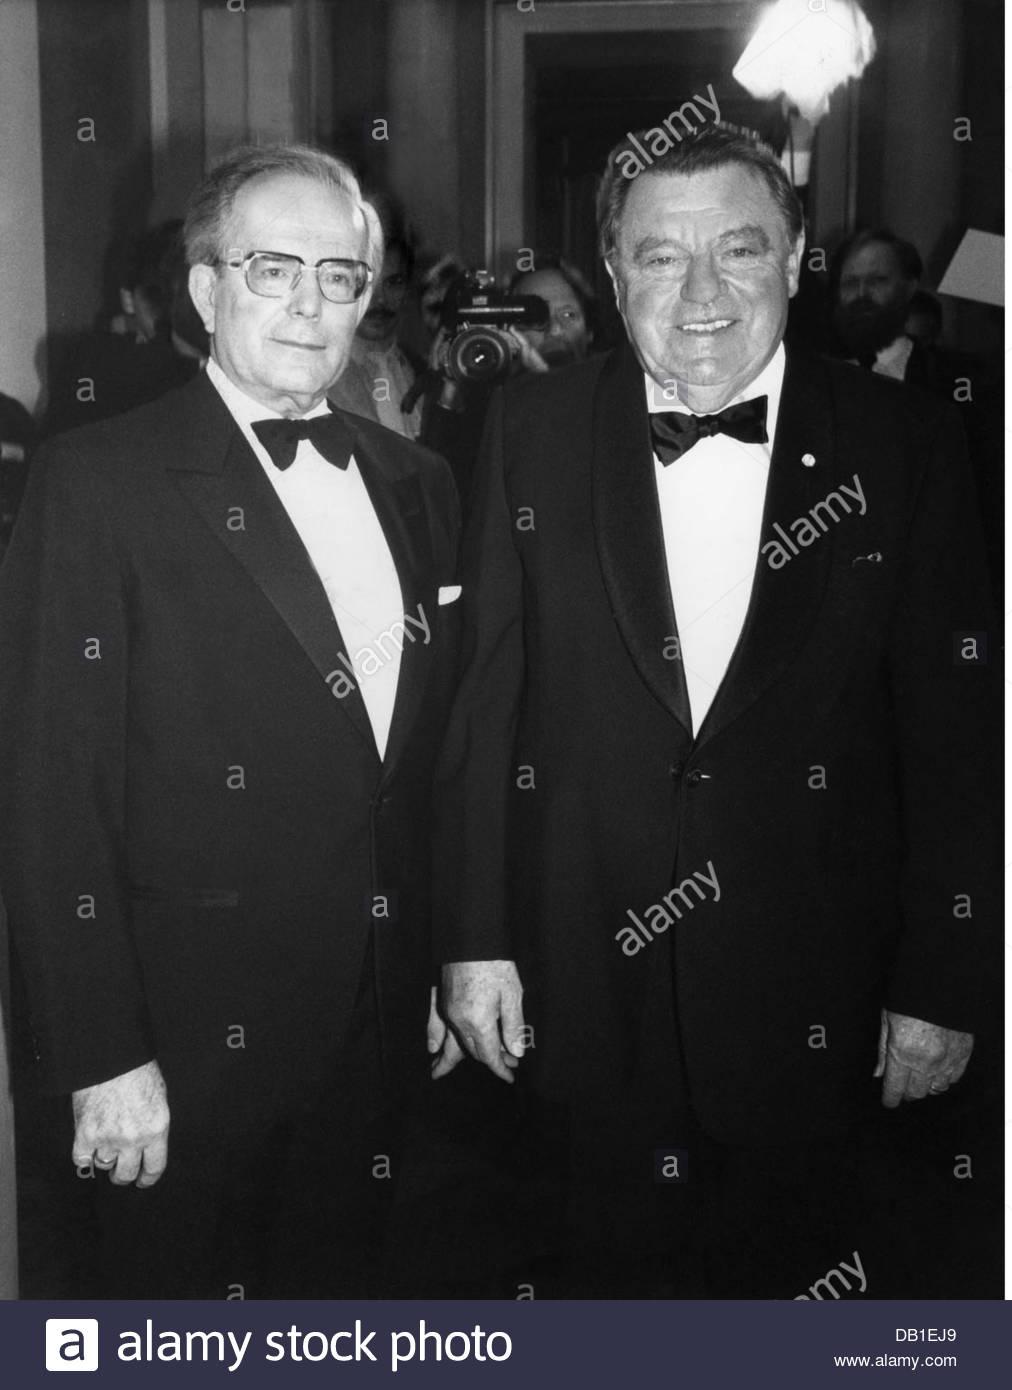 Strauss, Franz Josef, 6.9.1915 - 3.10.1988, German politician (CSU), Prime Minister of Bavaria 6.11.1978 - 3.10.1988, - Stock Image